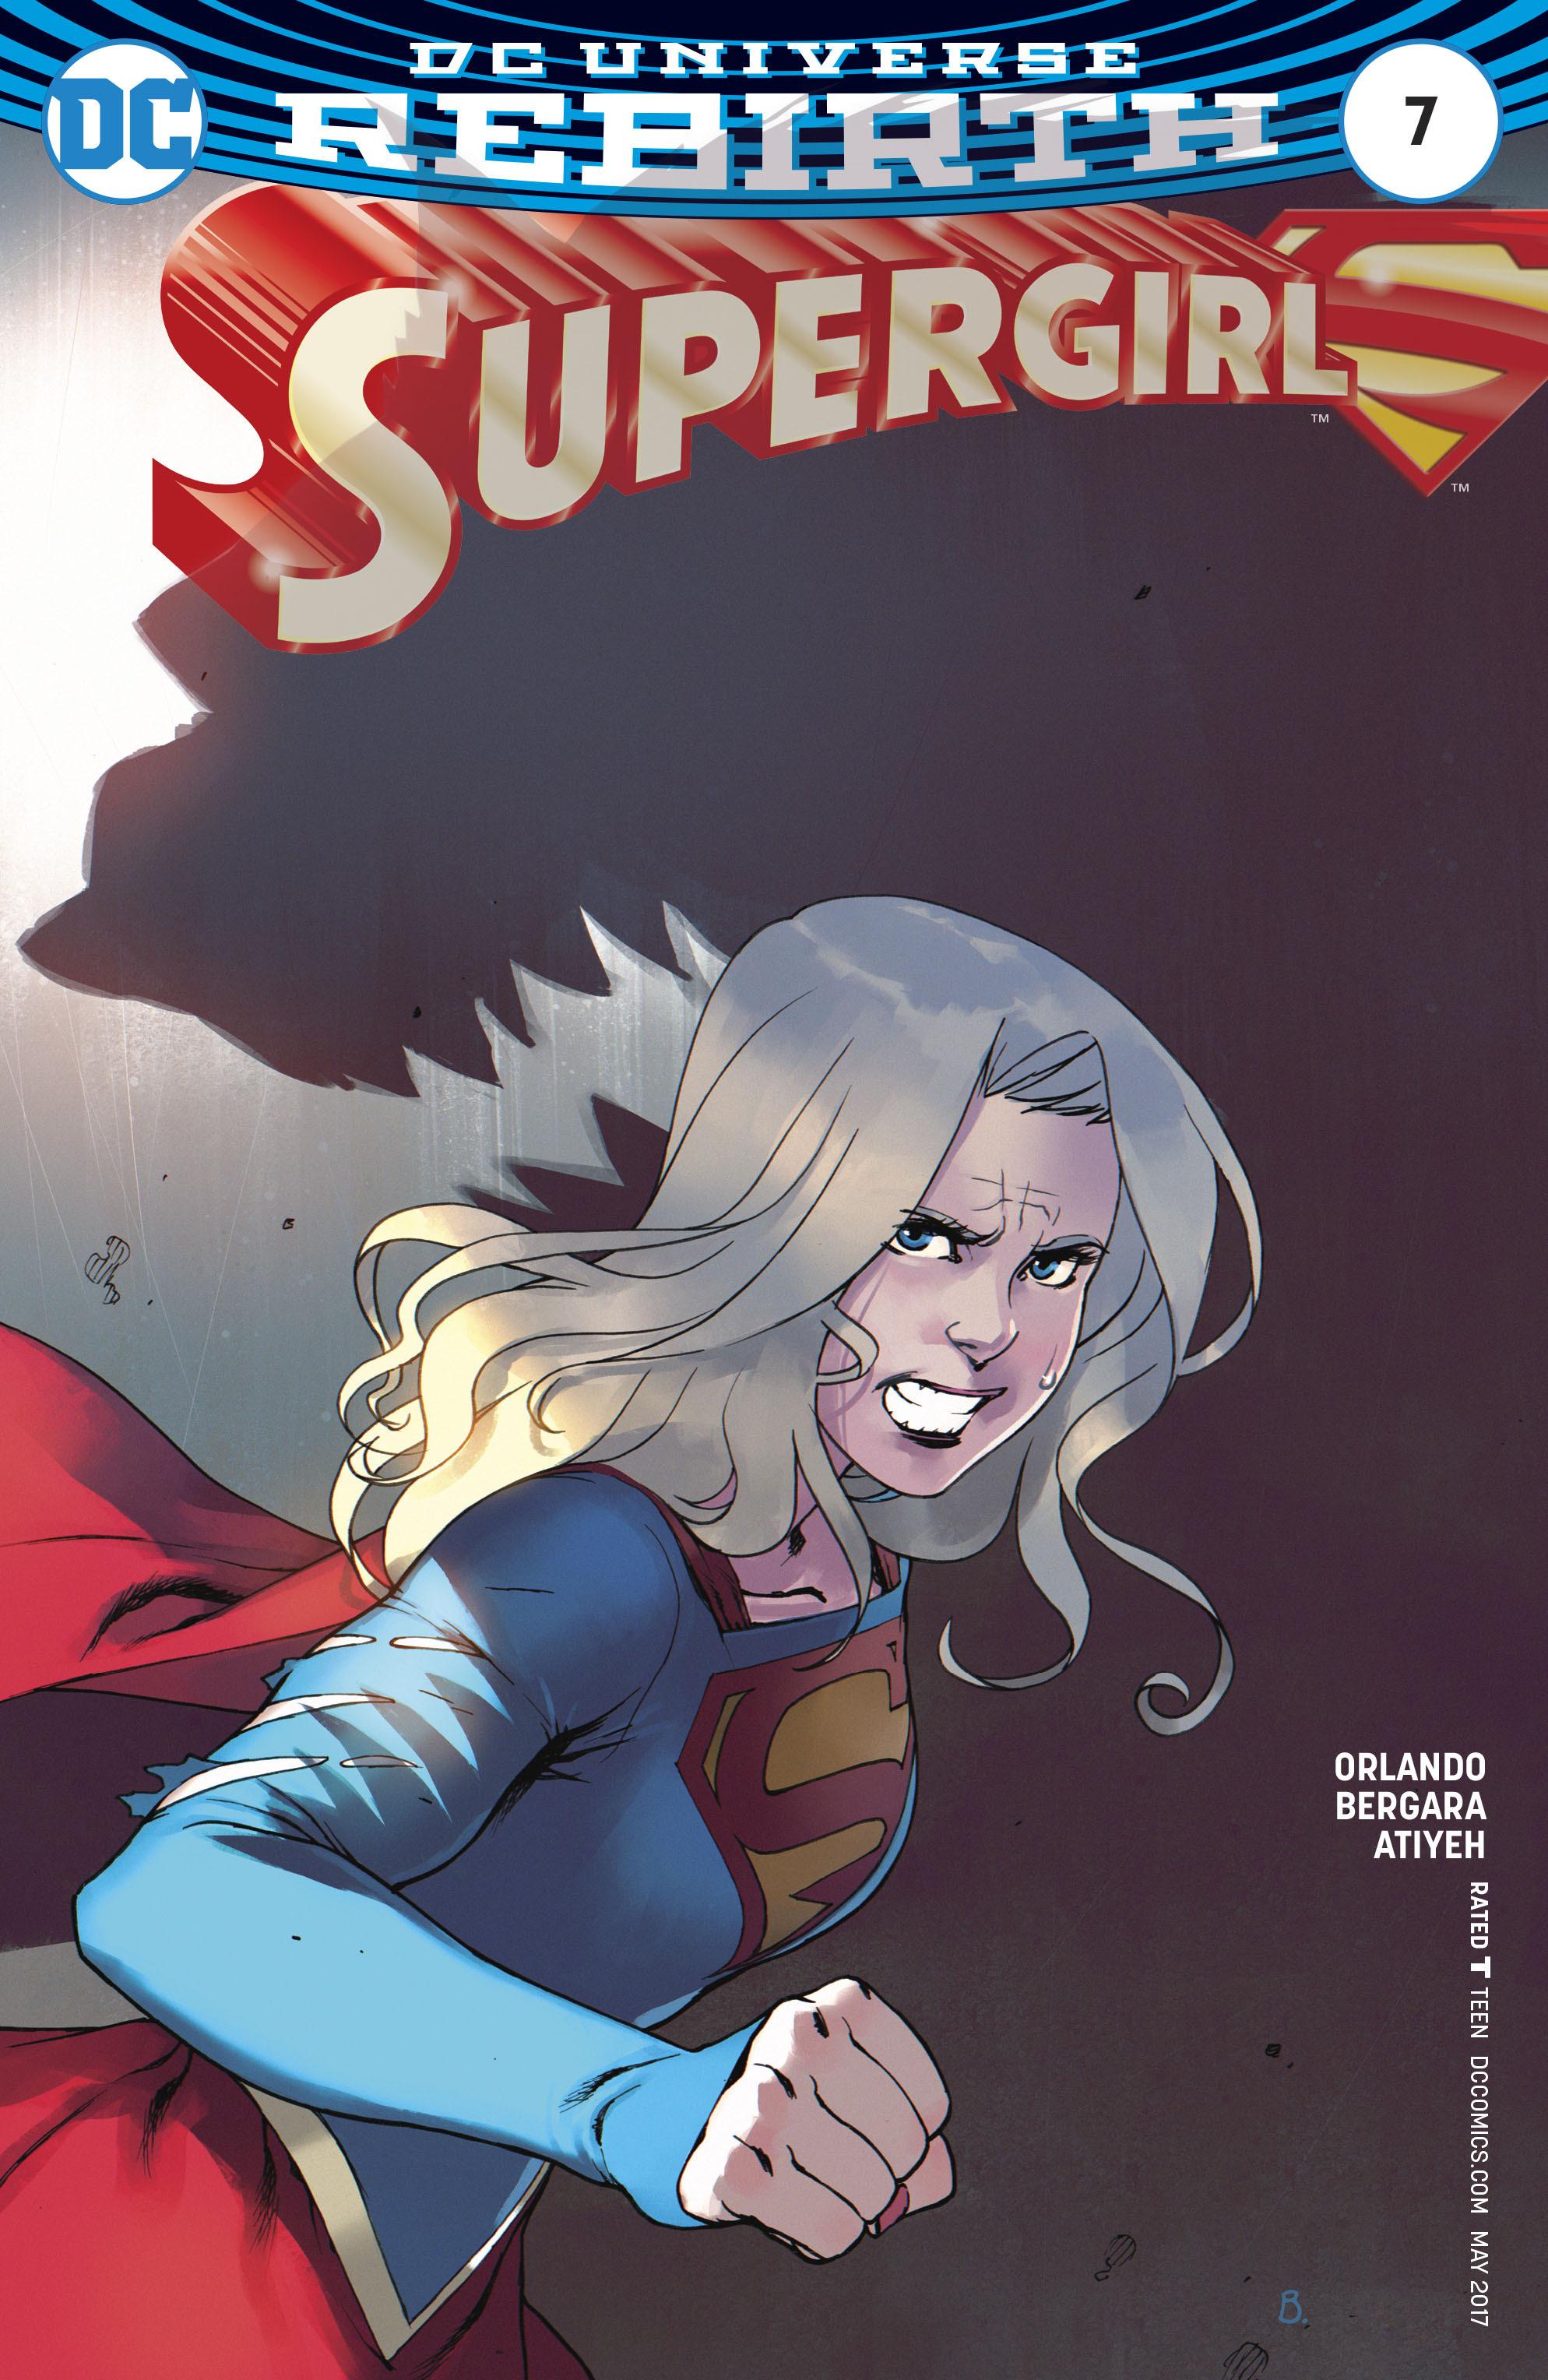 Supergirl Vol 7 7 Variant.jpg